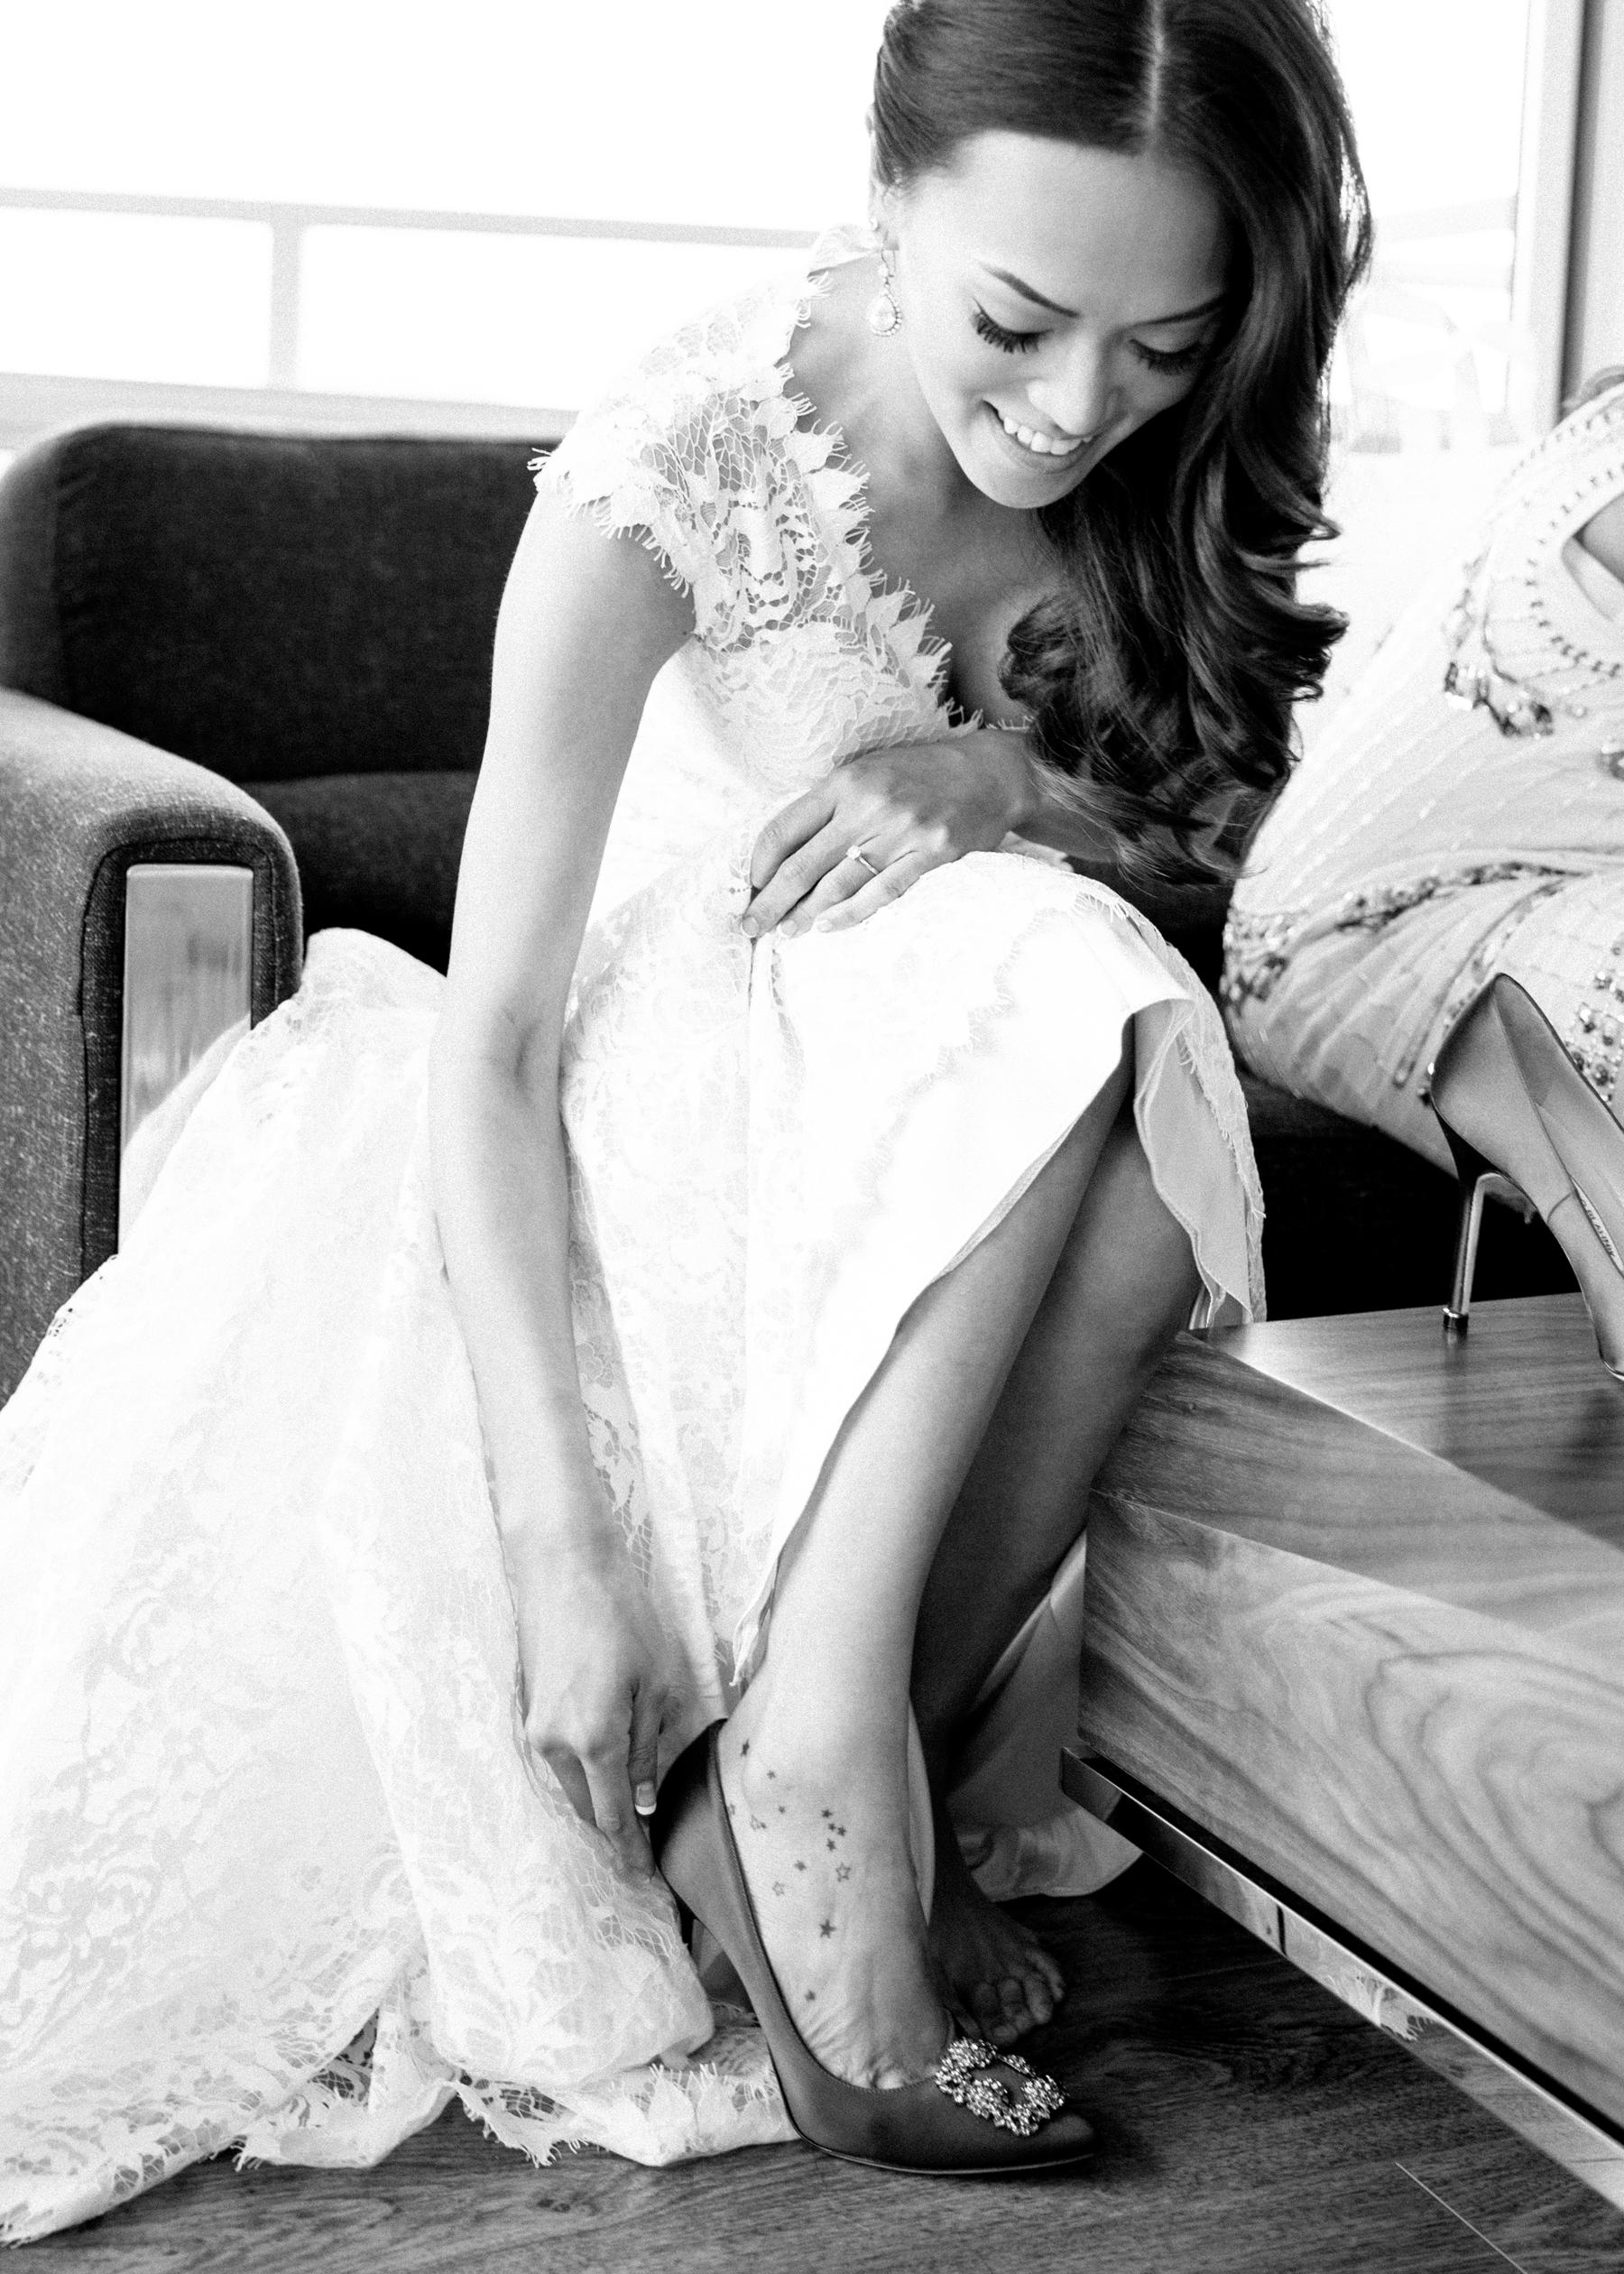 kaoverii_silva_photographer_via-herafilms_kieu_kaz_wedding-4.jpg